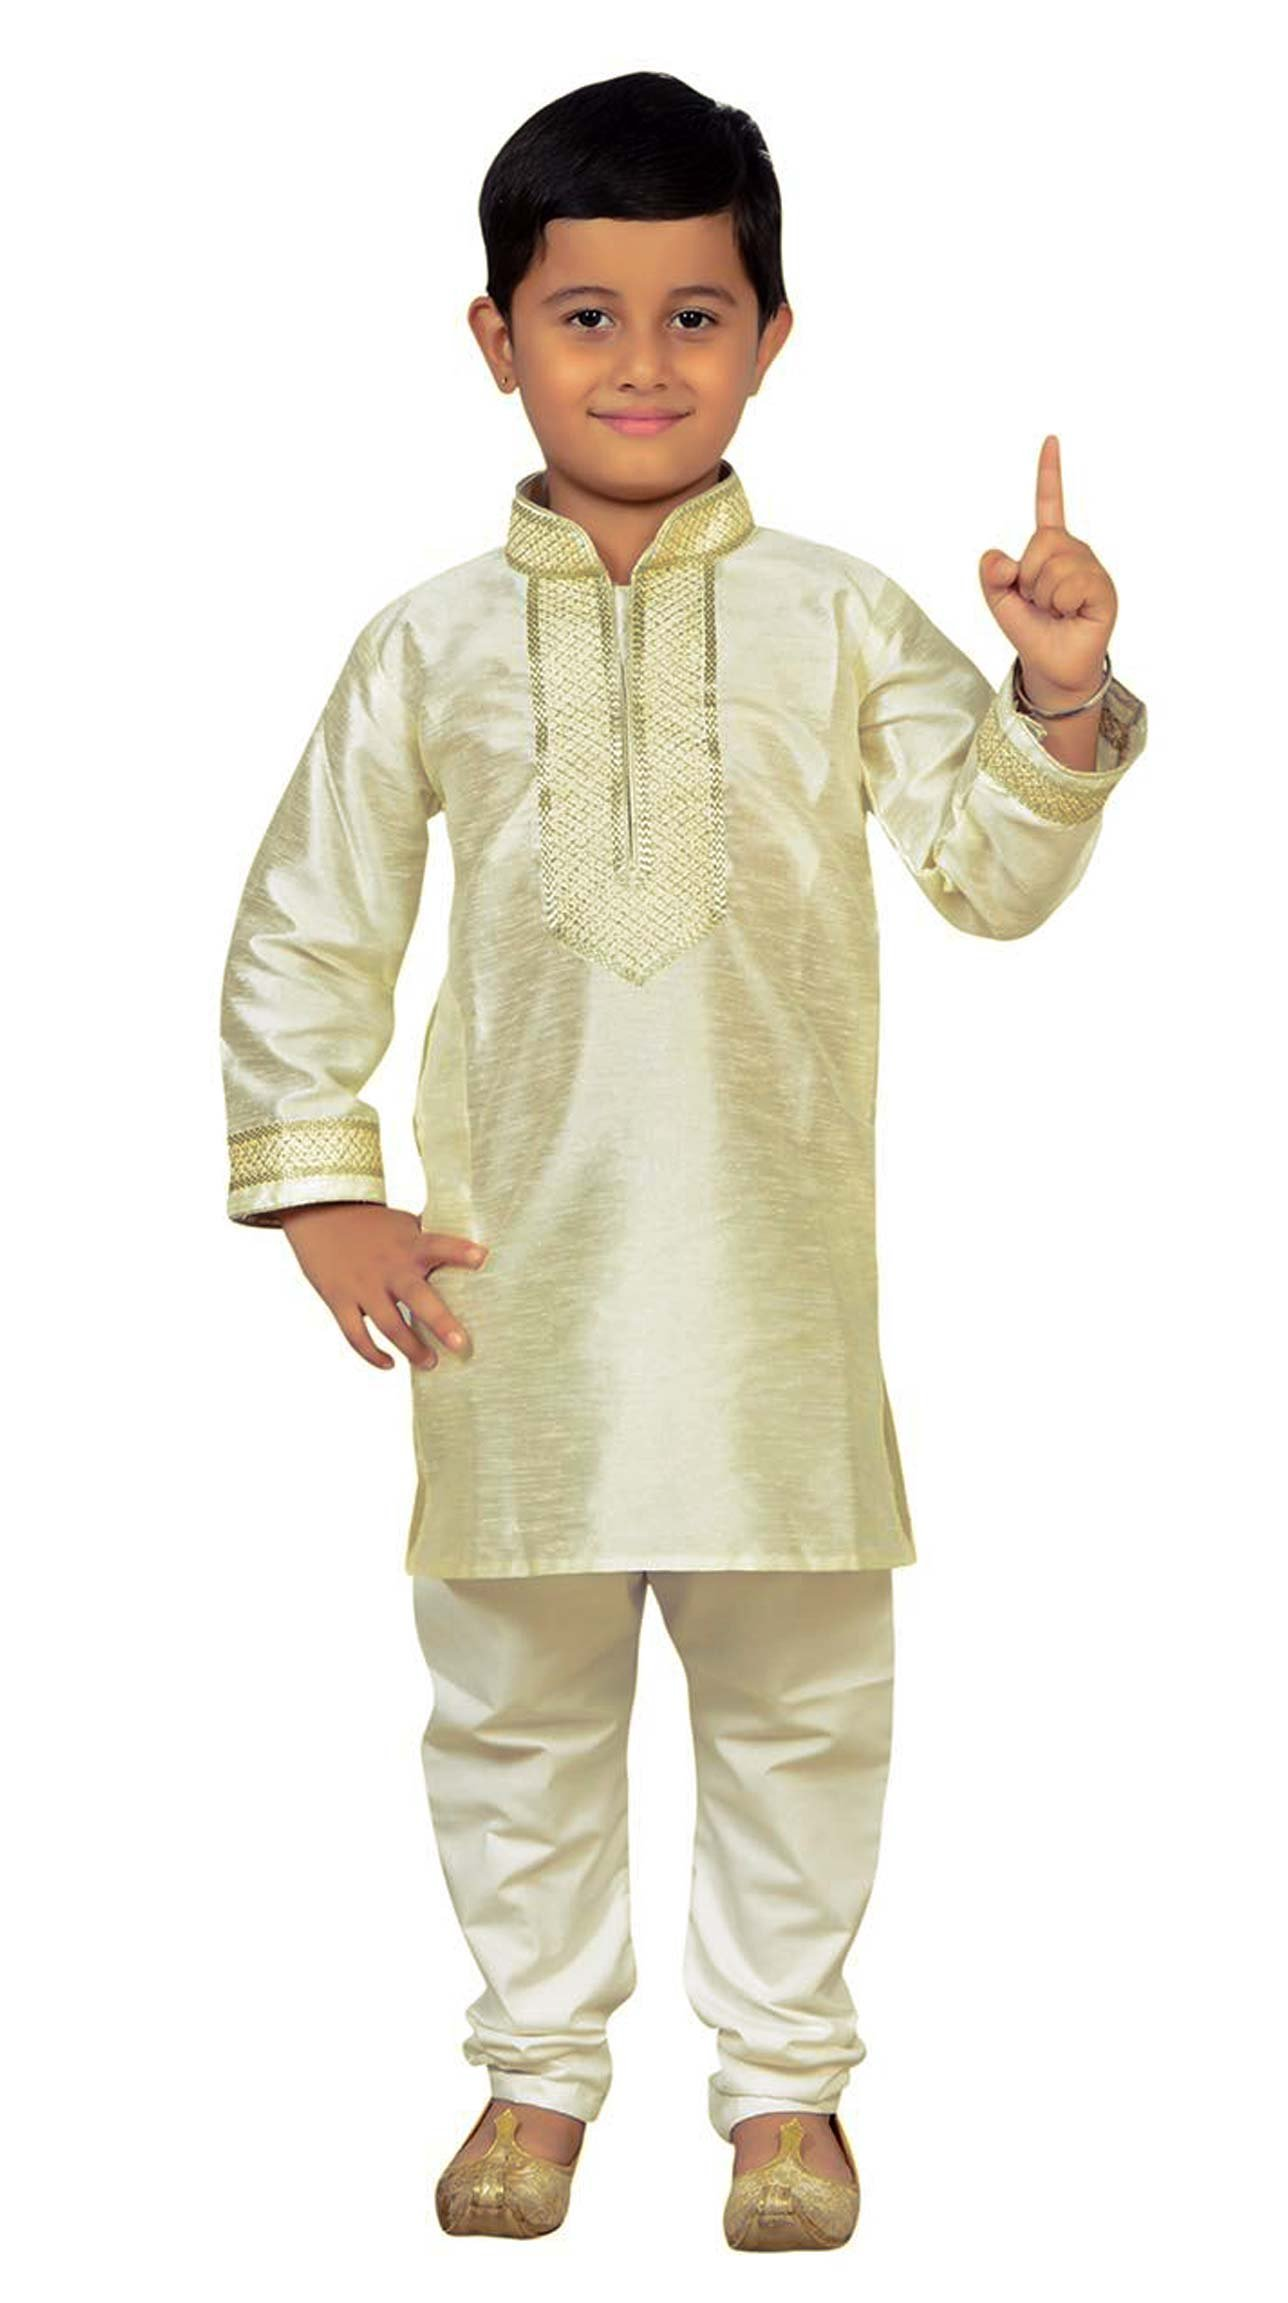 Boys Indian Off White Sherwani Kurta with Churidar pyjama in fine Art Silk for Bollywood theme party Costume 895 (4 (4 yrs), Off White)